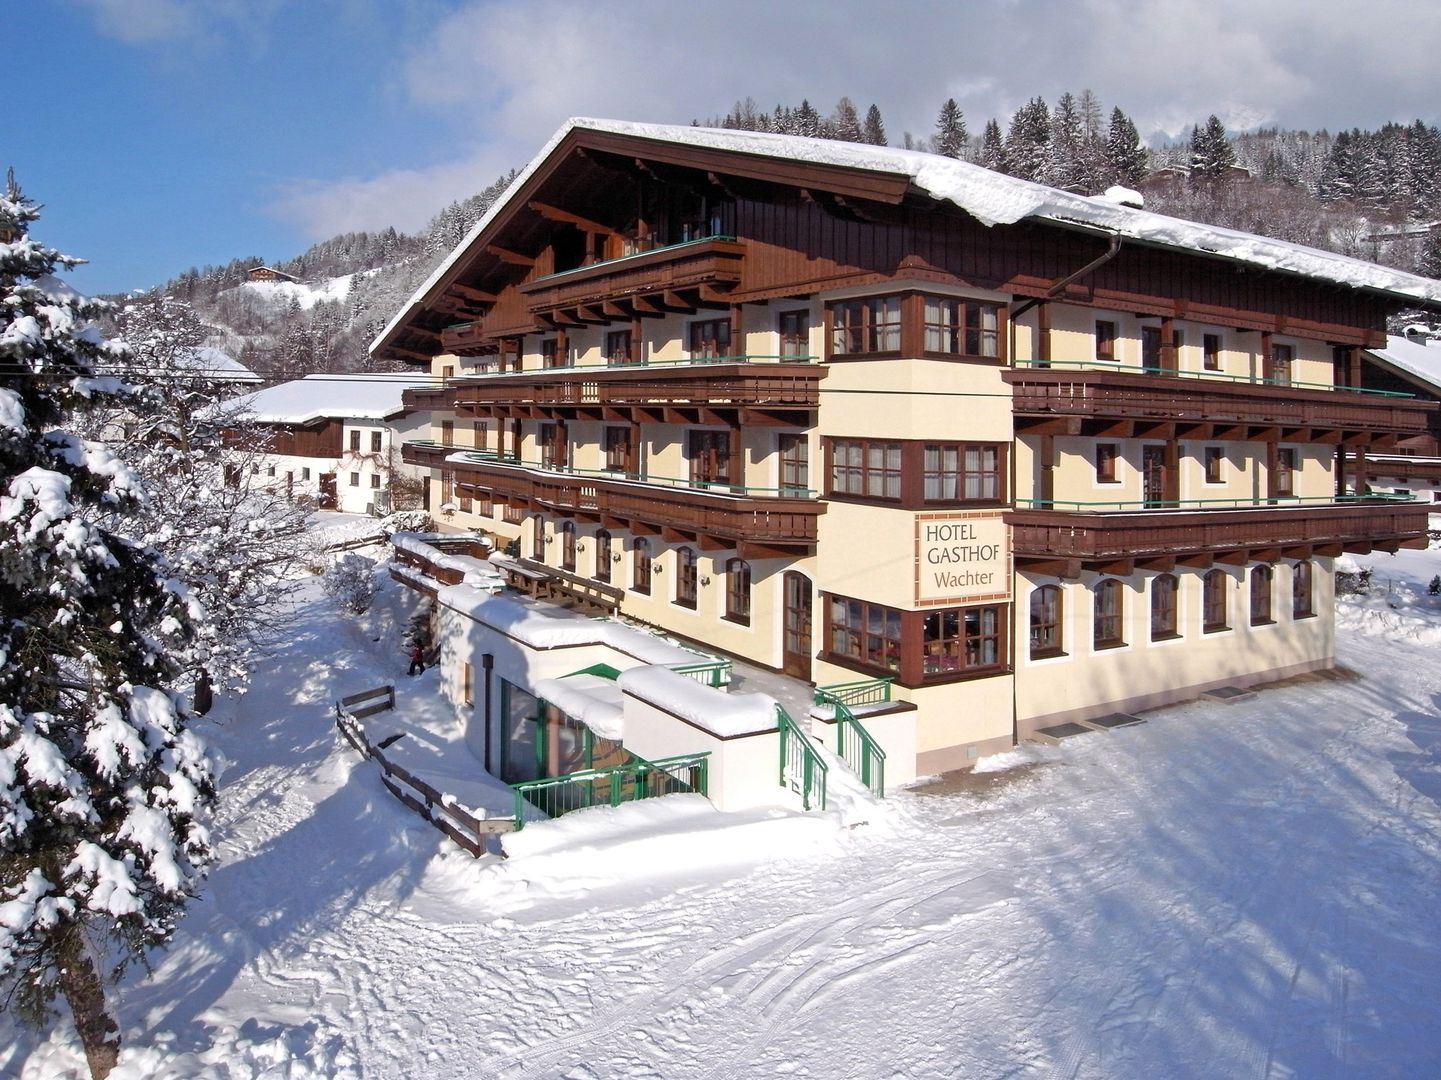 Hotel Gasthof Wachter - Slide 1